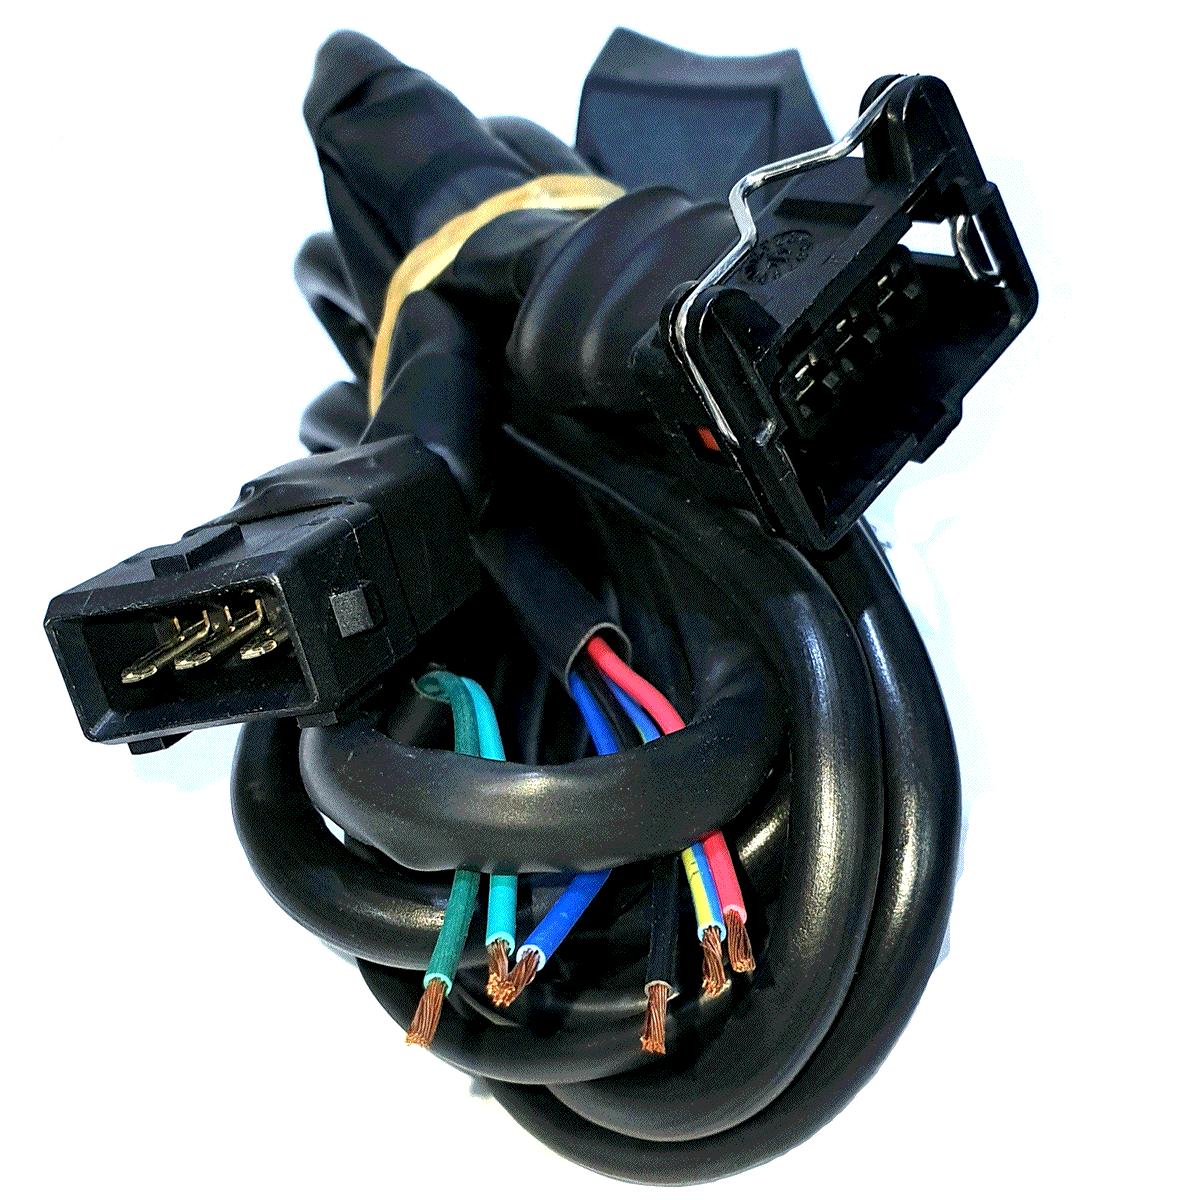 Chicote de Variador AEB510N Cobra